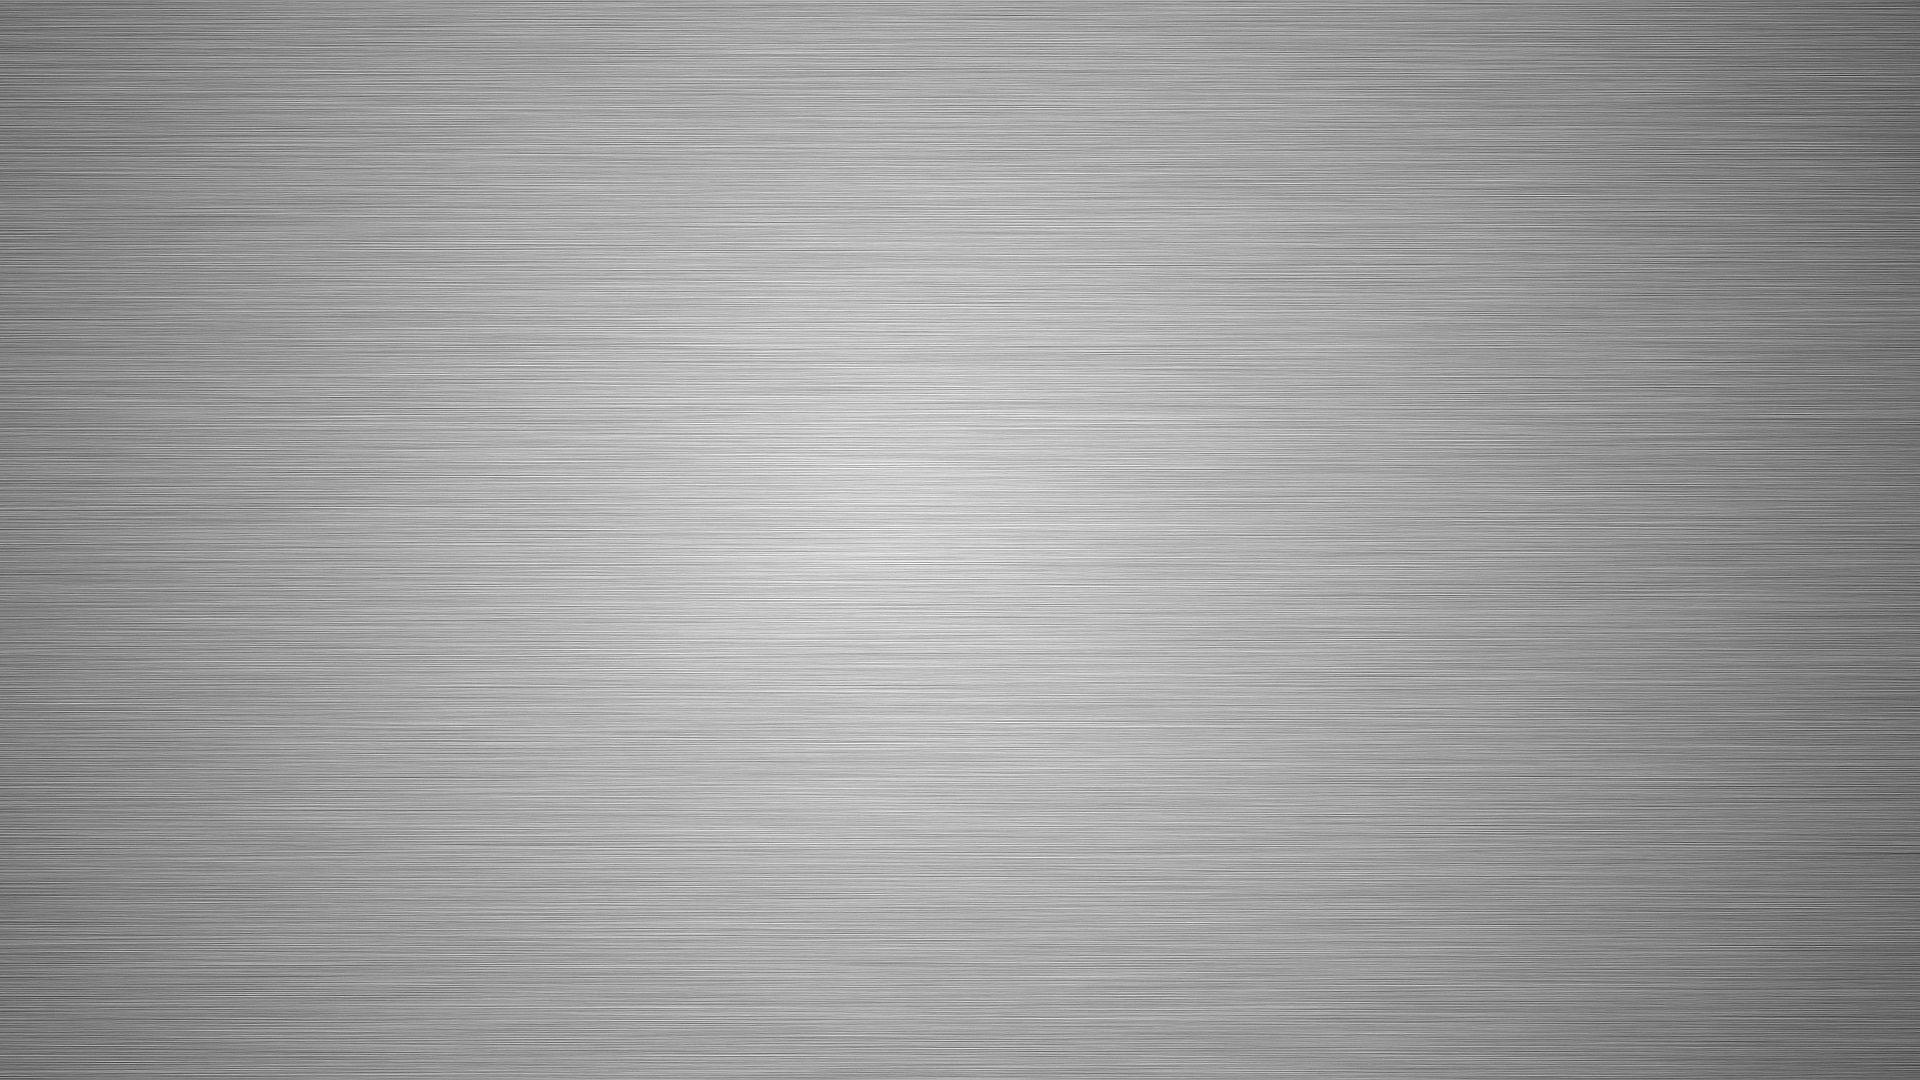 Aluminum Wallpaper Full HD Wallpaper Background Photos HD 1920x1080